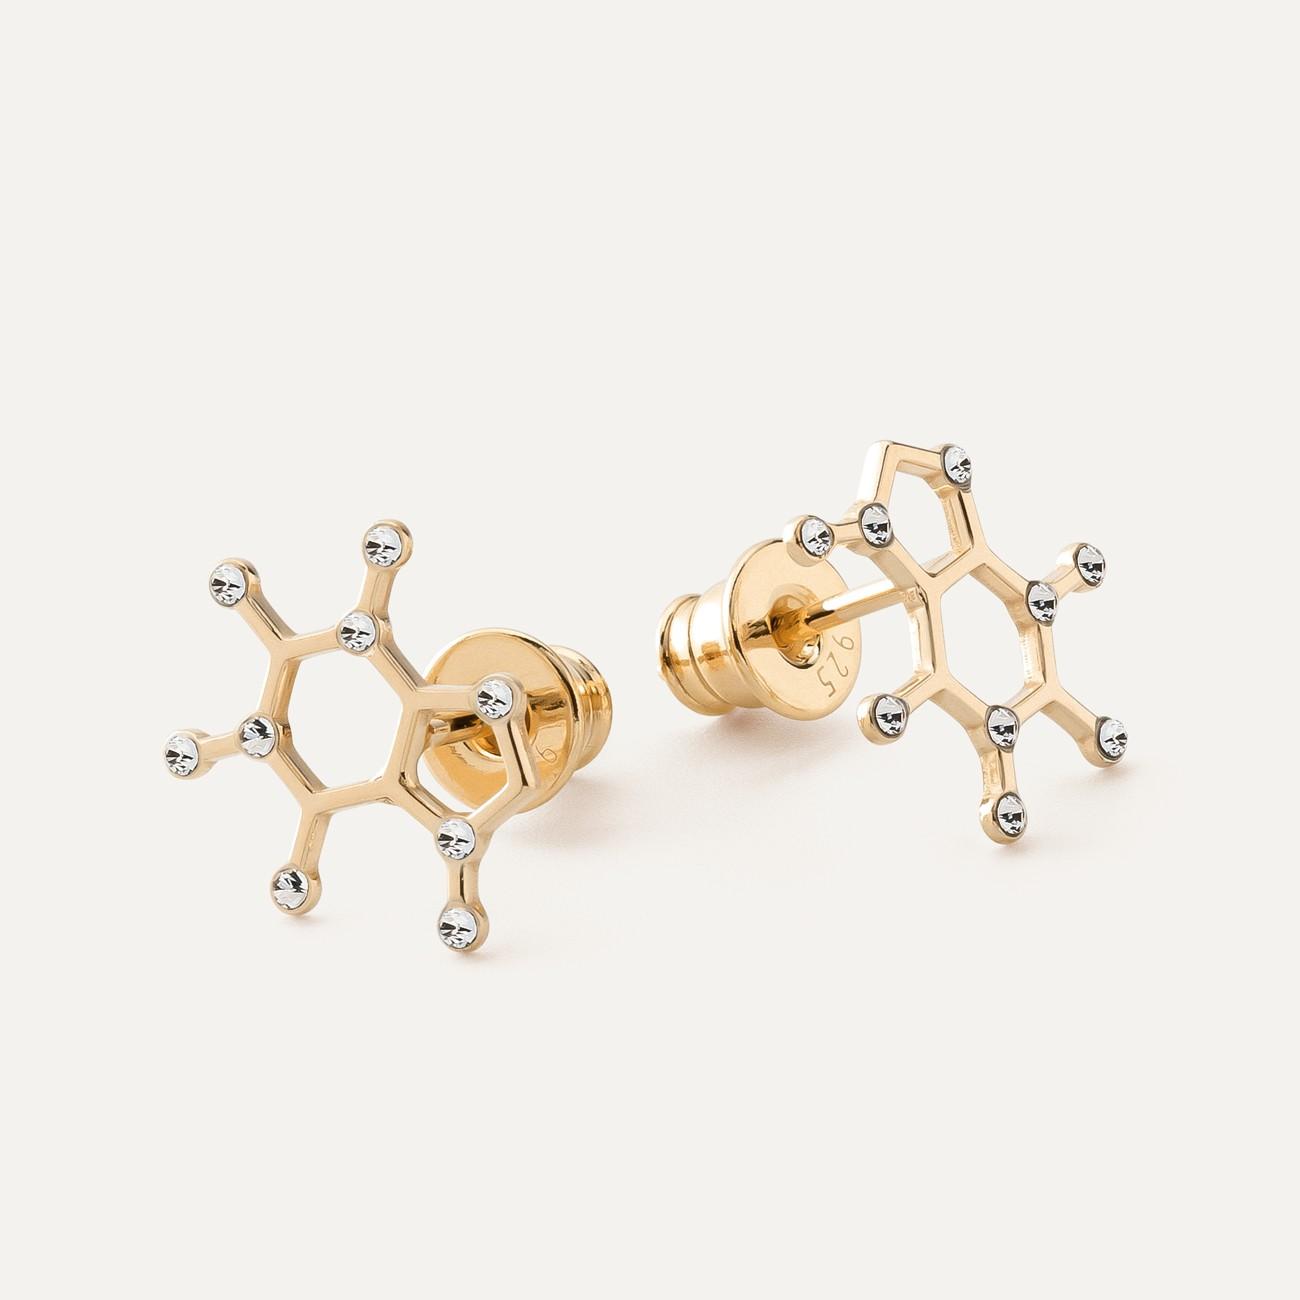 SEROTONIN EARRINGS CHEMICAL FORMULA STERLING SILVER & SWAROVSKI CRYSTALS